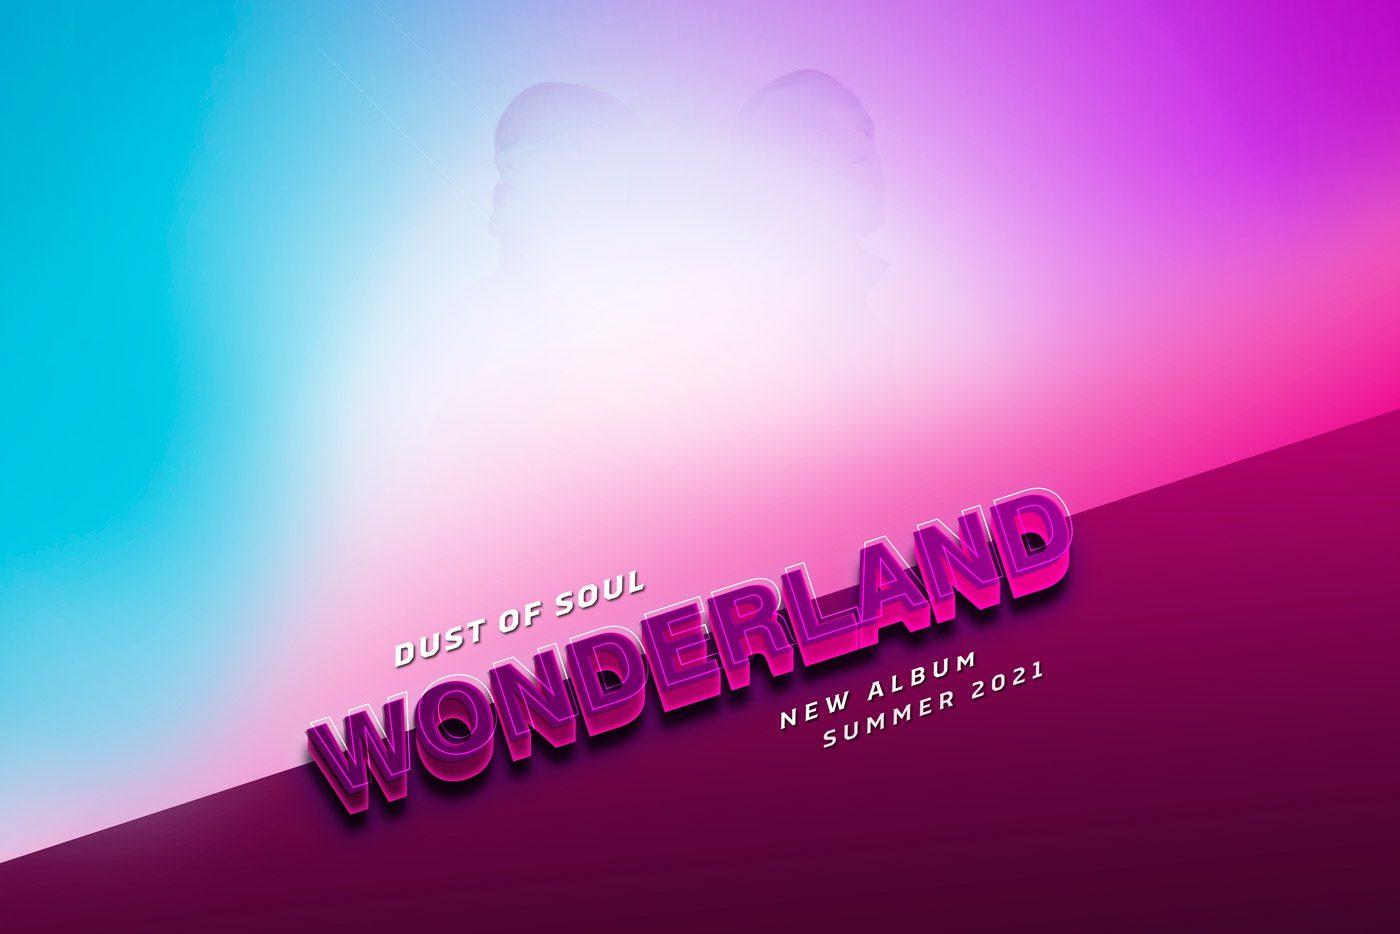 Dust of Soul New Album Wonderland Coming Summer 2021